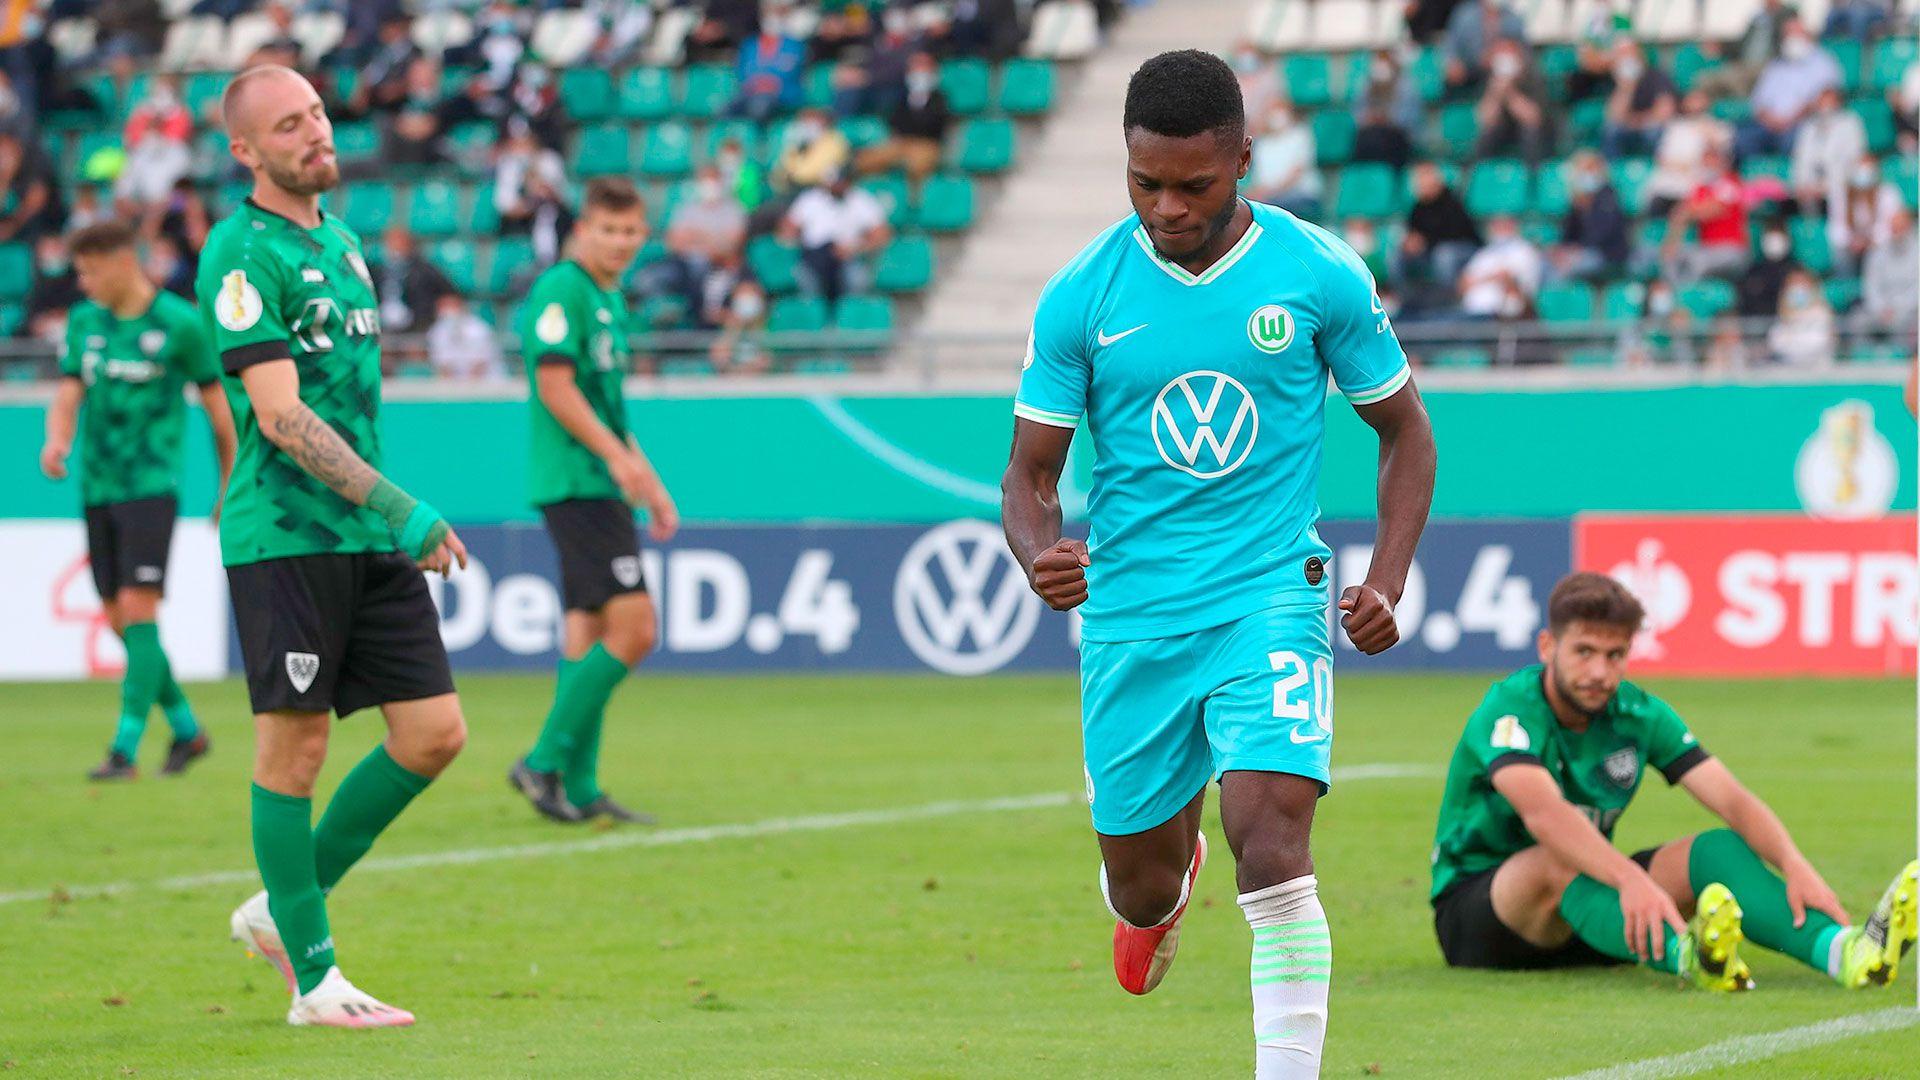 Wolfsburgo-vs-Preußen-Münster